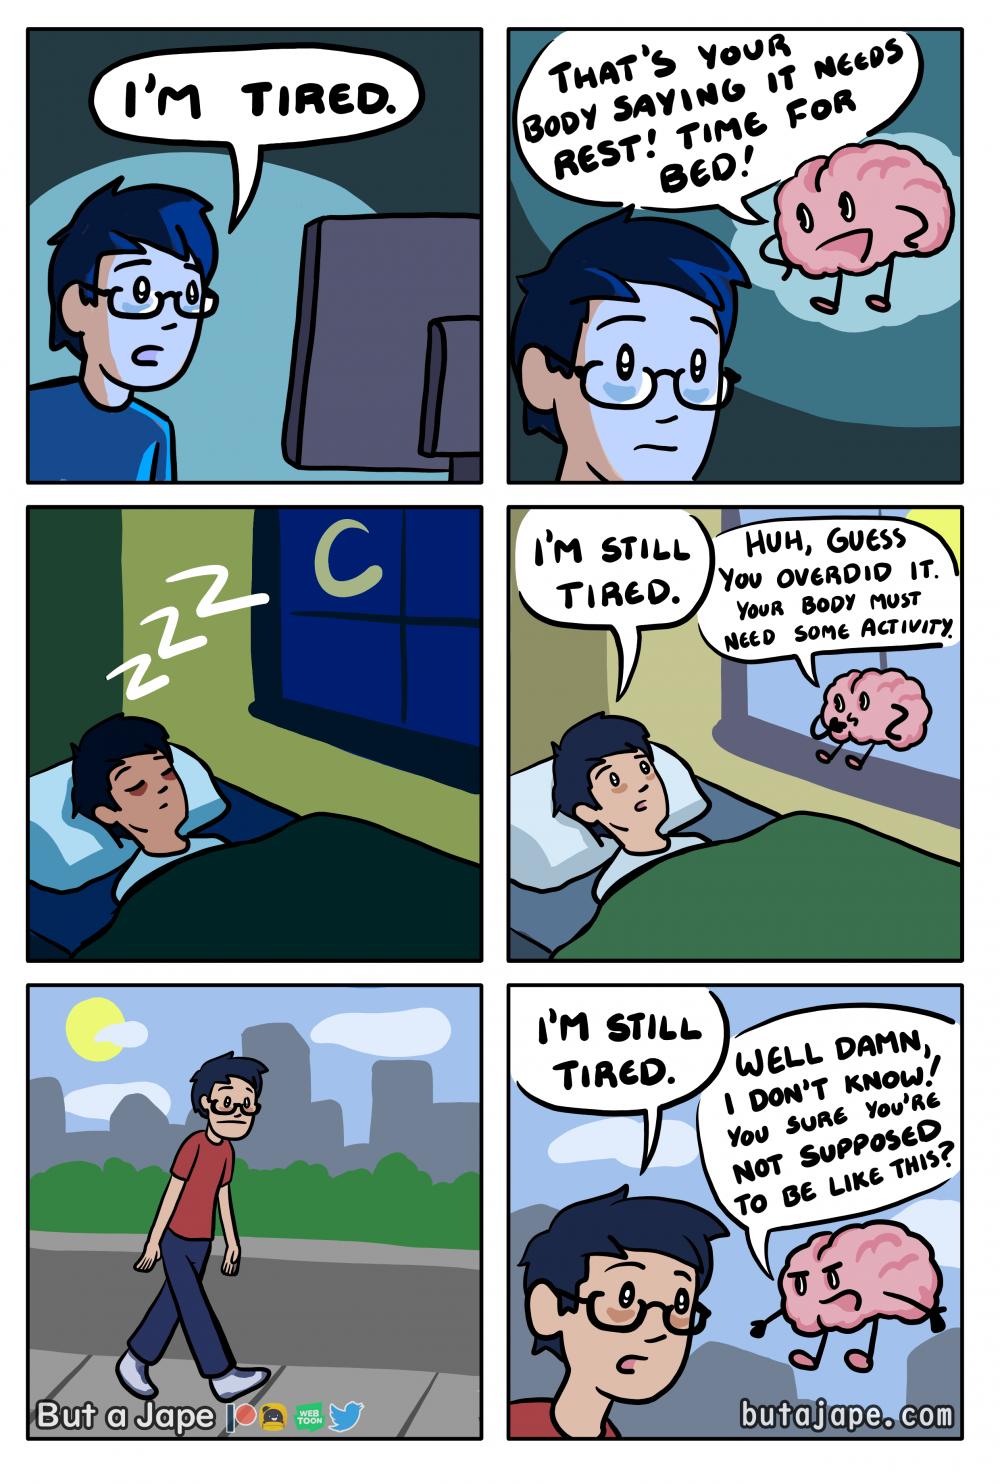 i'm tired comic